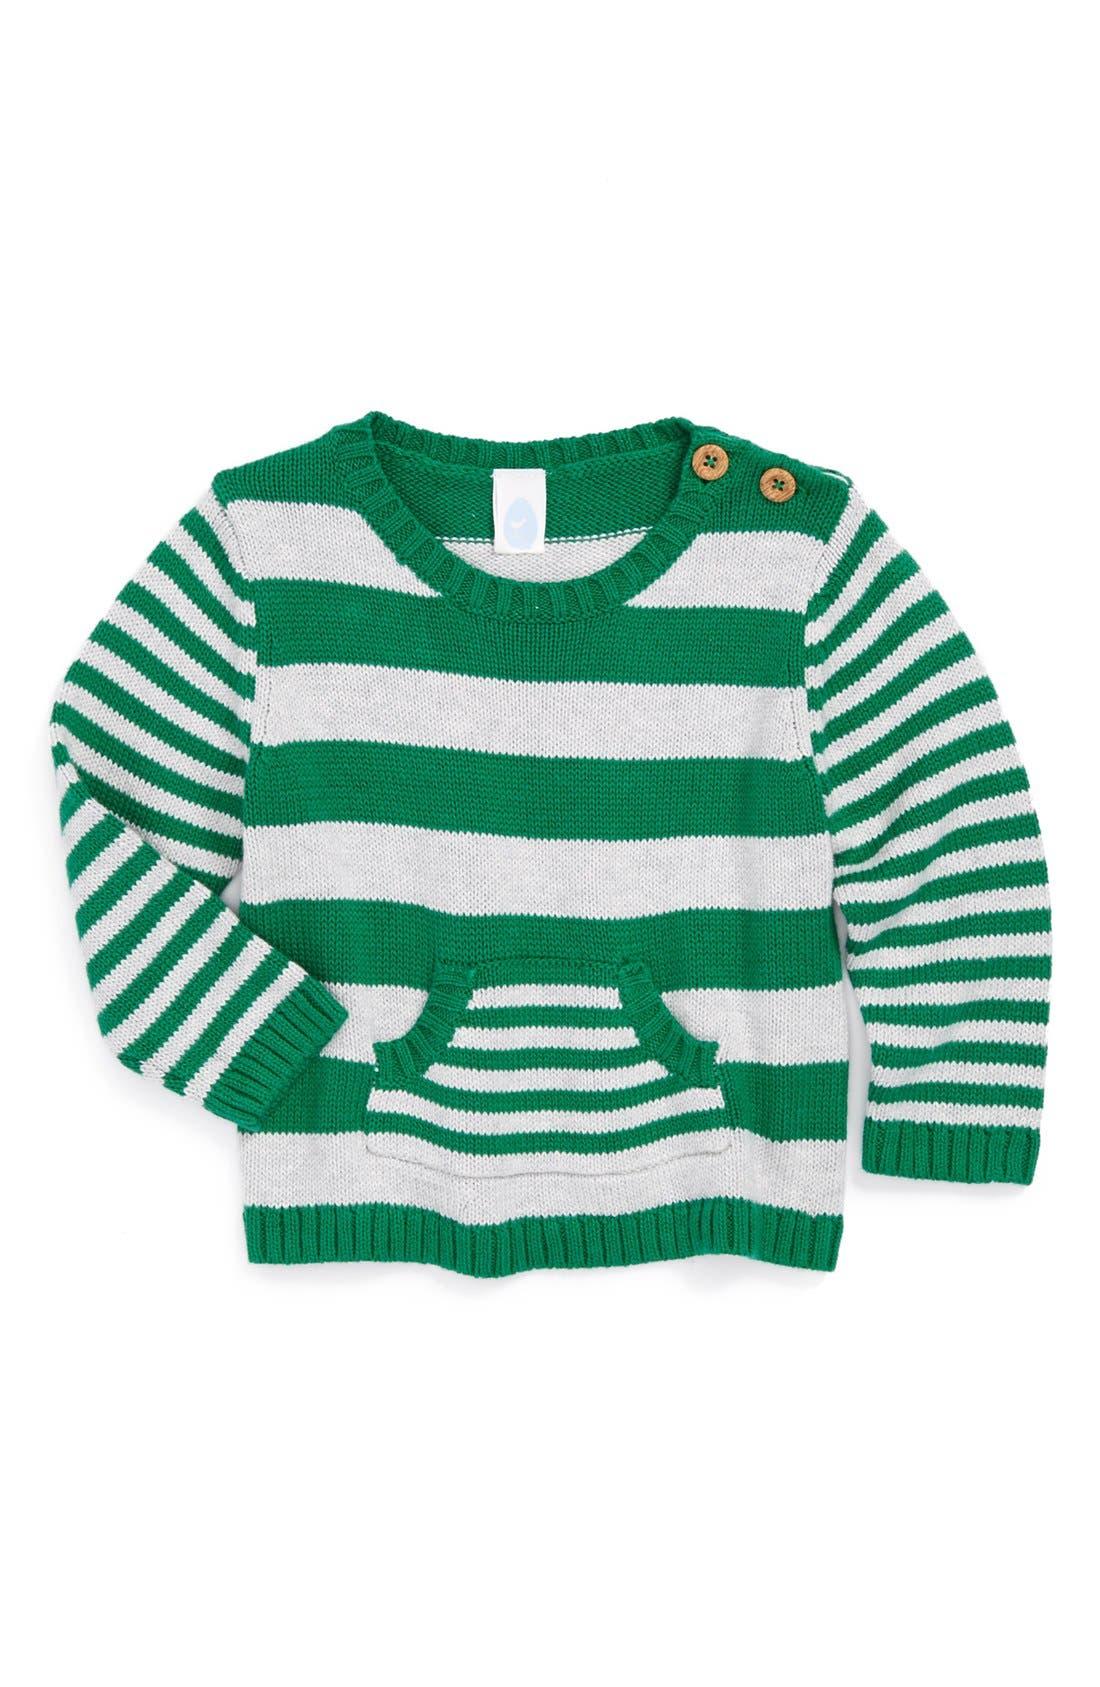 Main Image - Stem Baby Organic Cotton Sweater (Baby Boys)